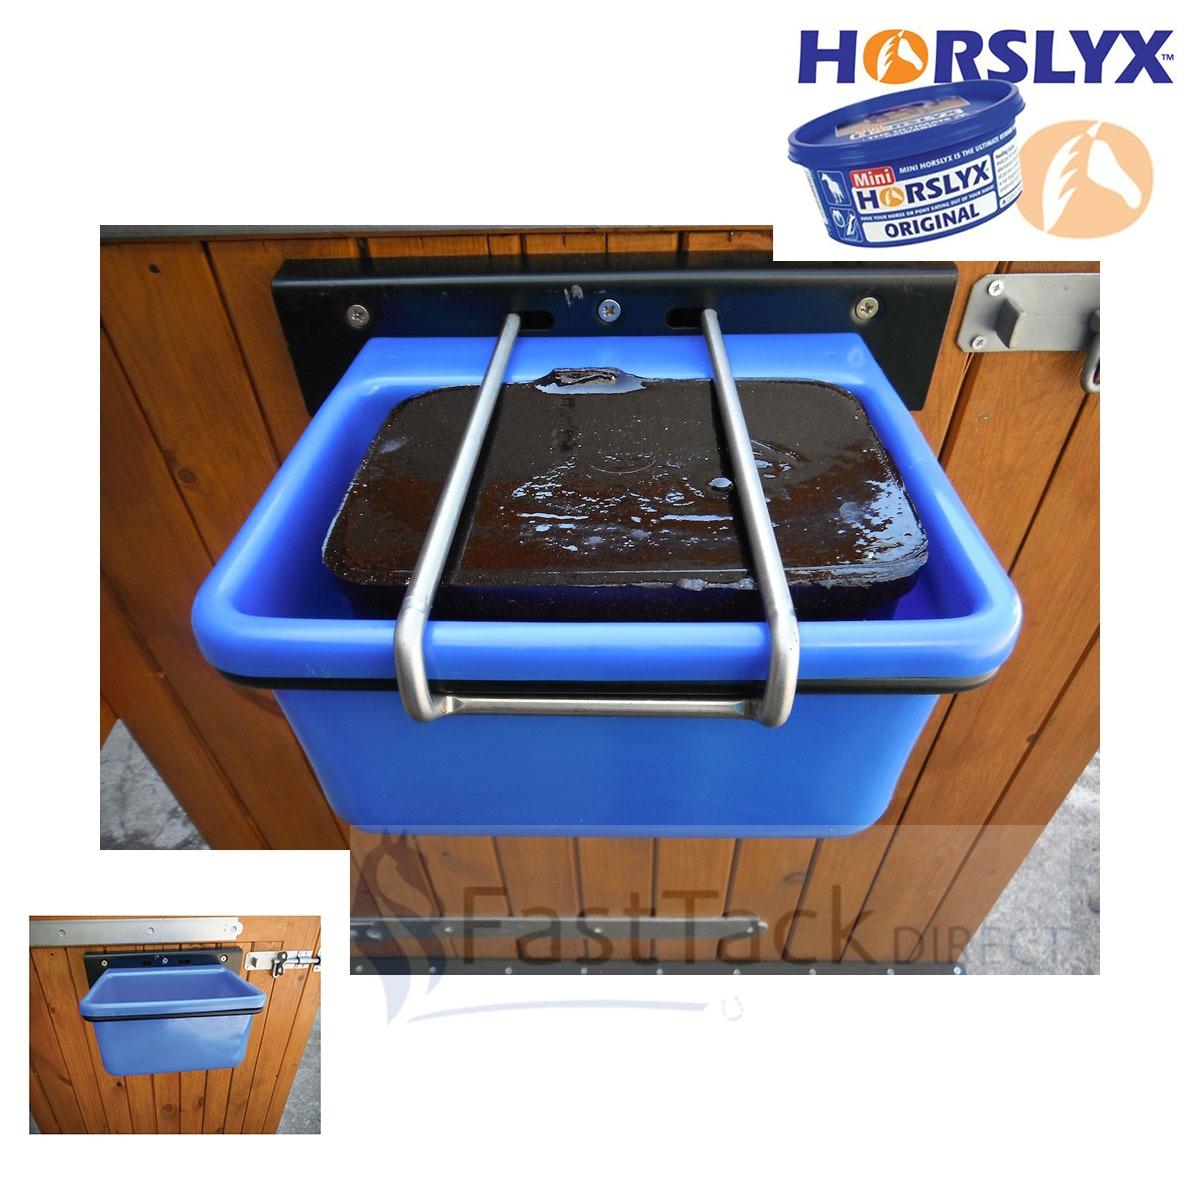 Horslyx 5kg Holder Horse Treat Storage Fast Tack Direct